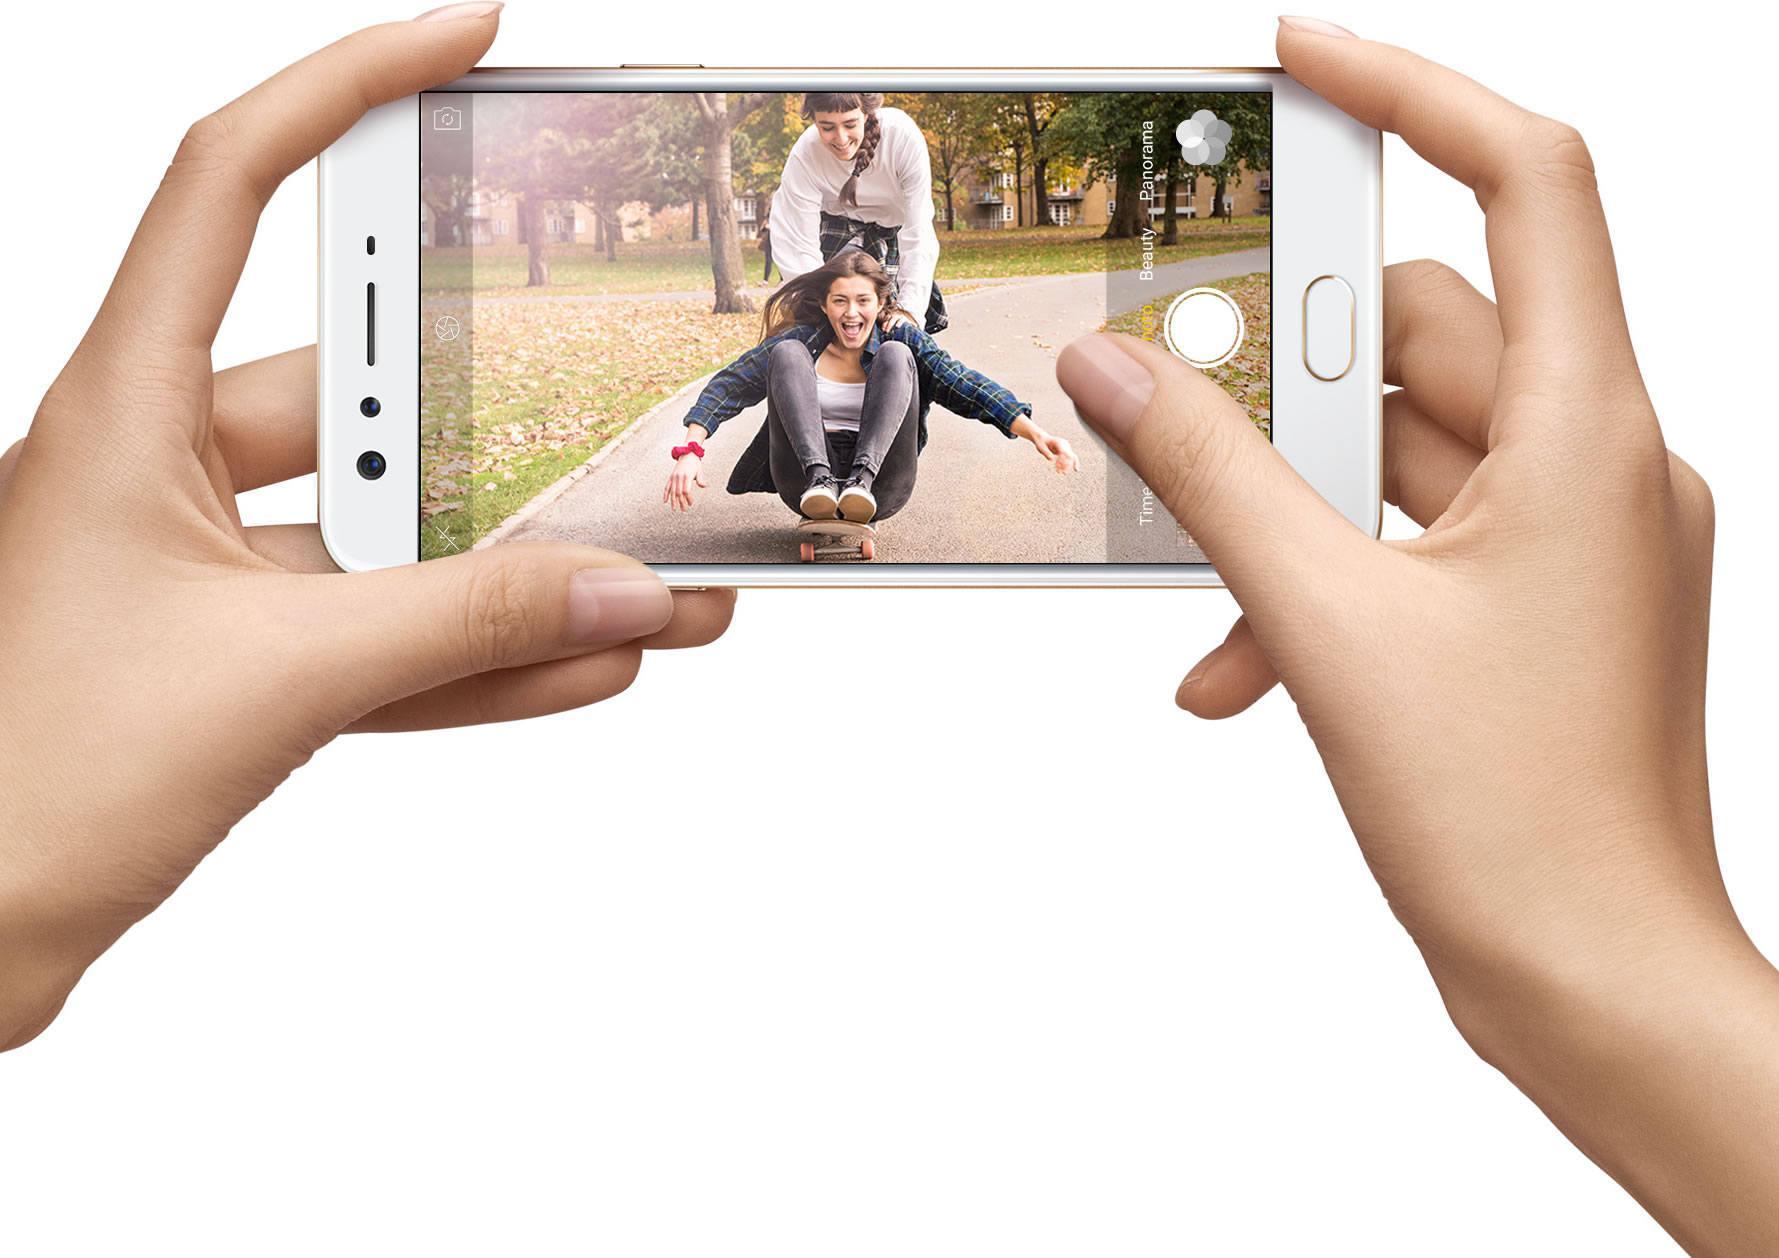 OPPO F3 Plus tries to be twice the selfie expert - SlashGear